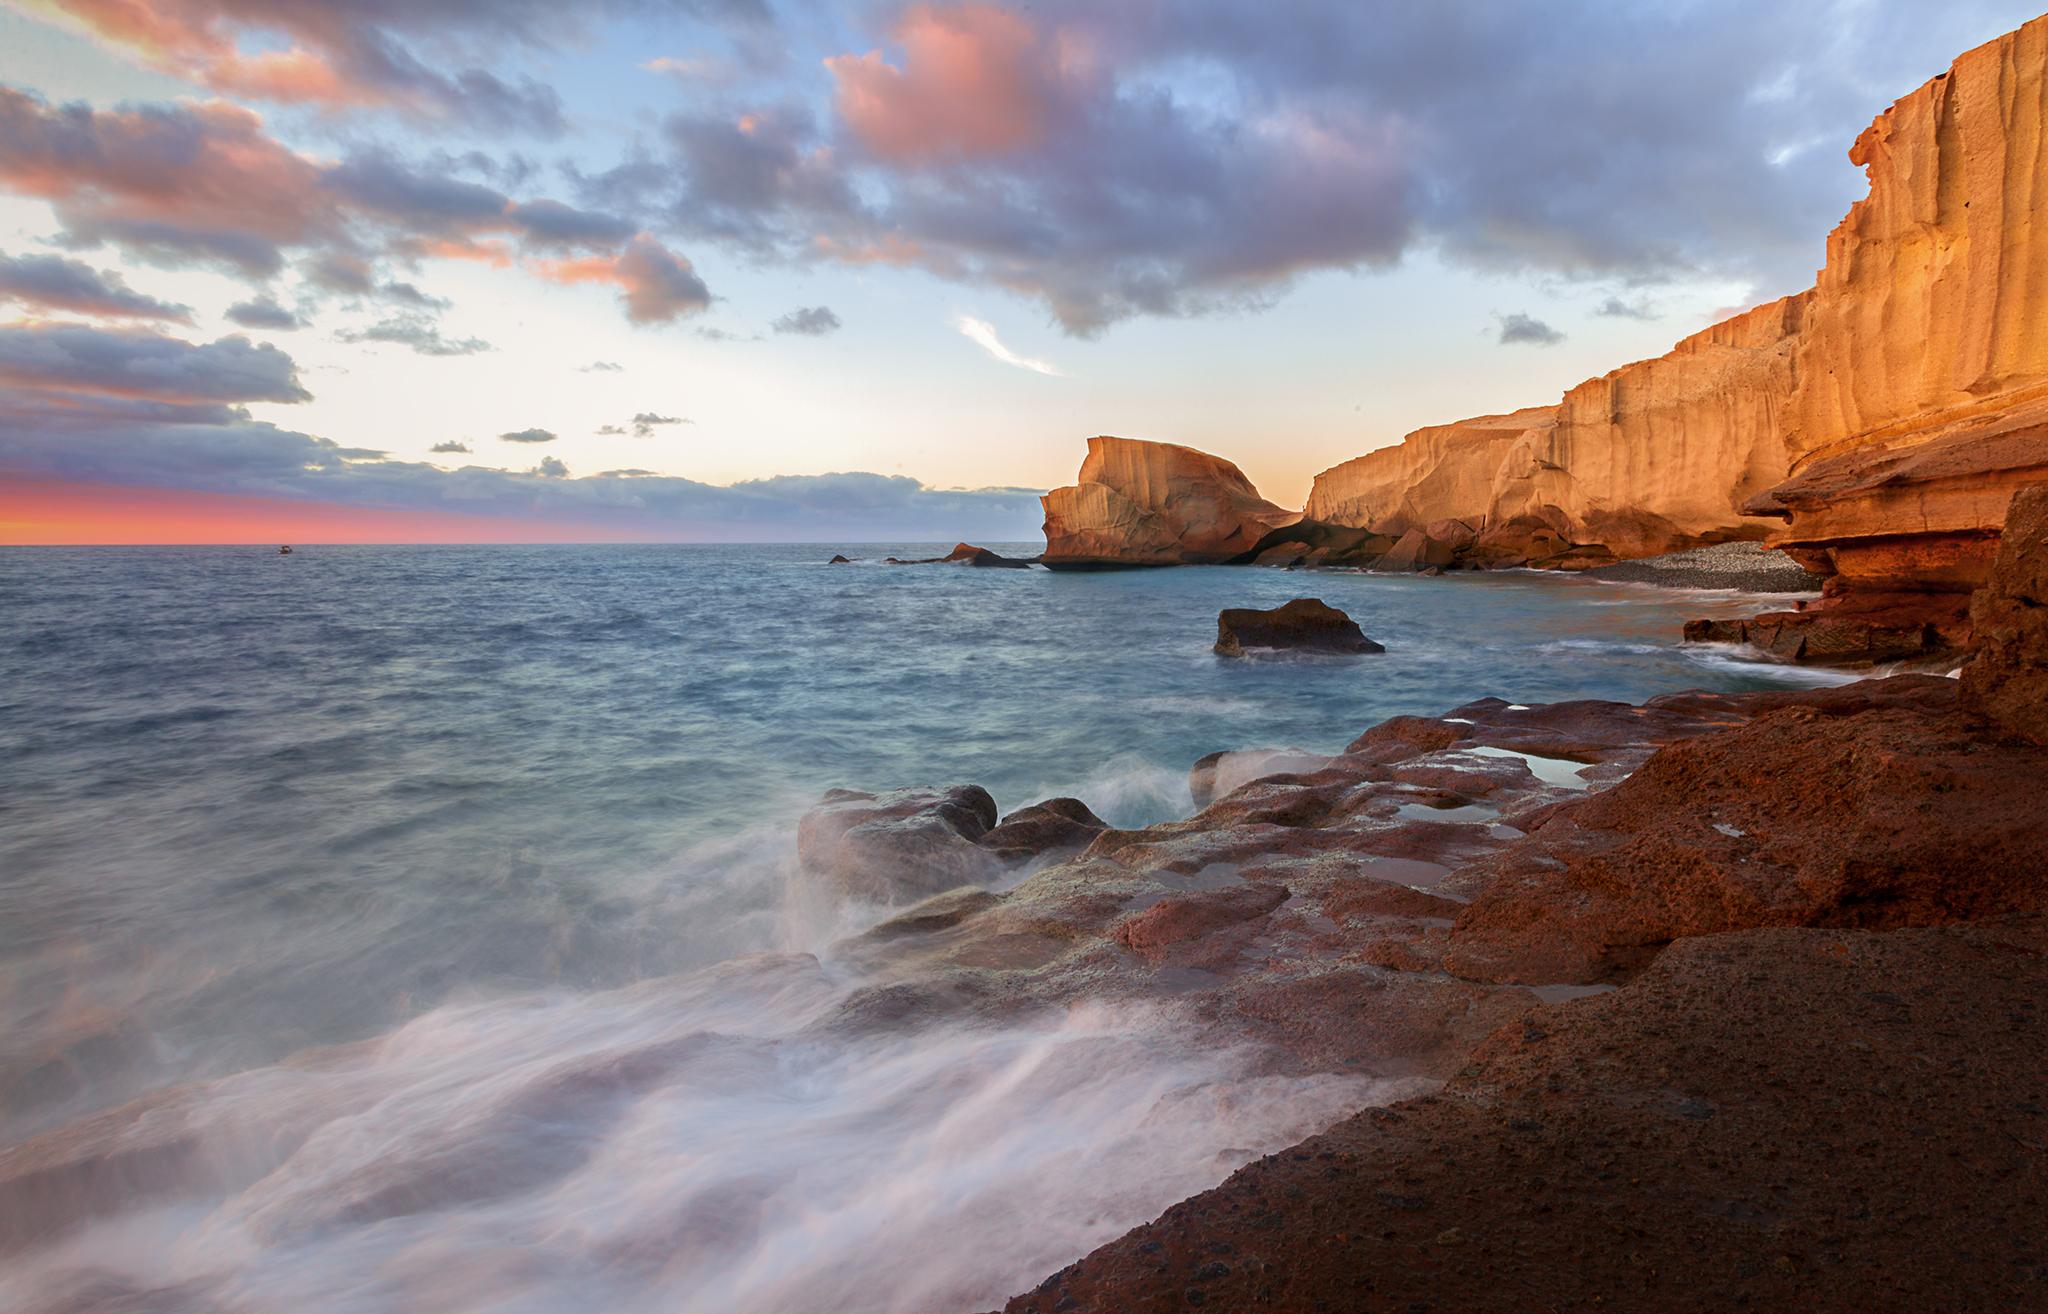 San Miguel beach. Photo by Florentina Cristina Catrinaru